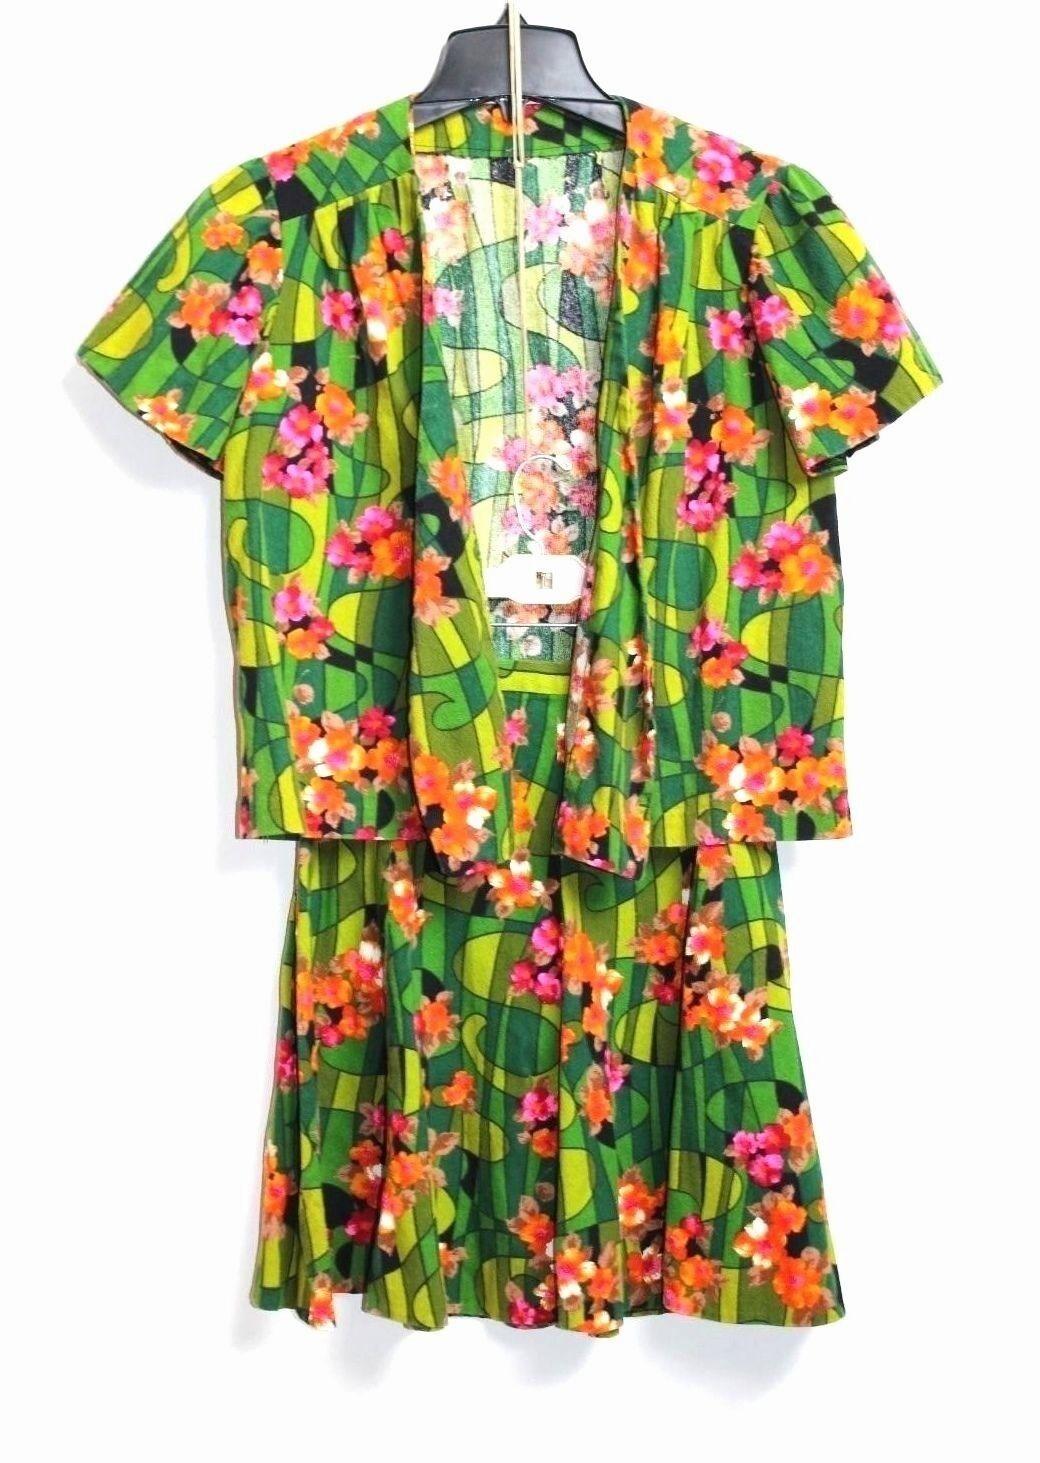 Handmade Handmade Handmade Vero Vintage Anni 70 - XXS XS - Multicolore Gonna a Fiori + S S Giacca 05a19d